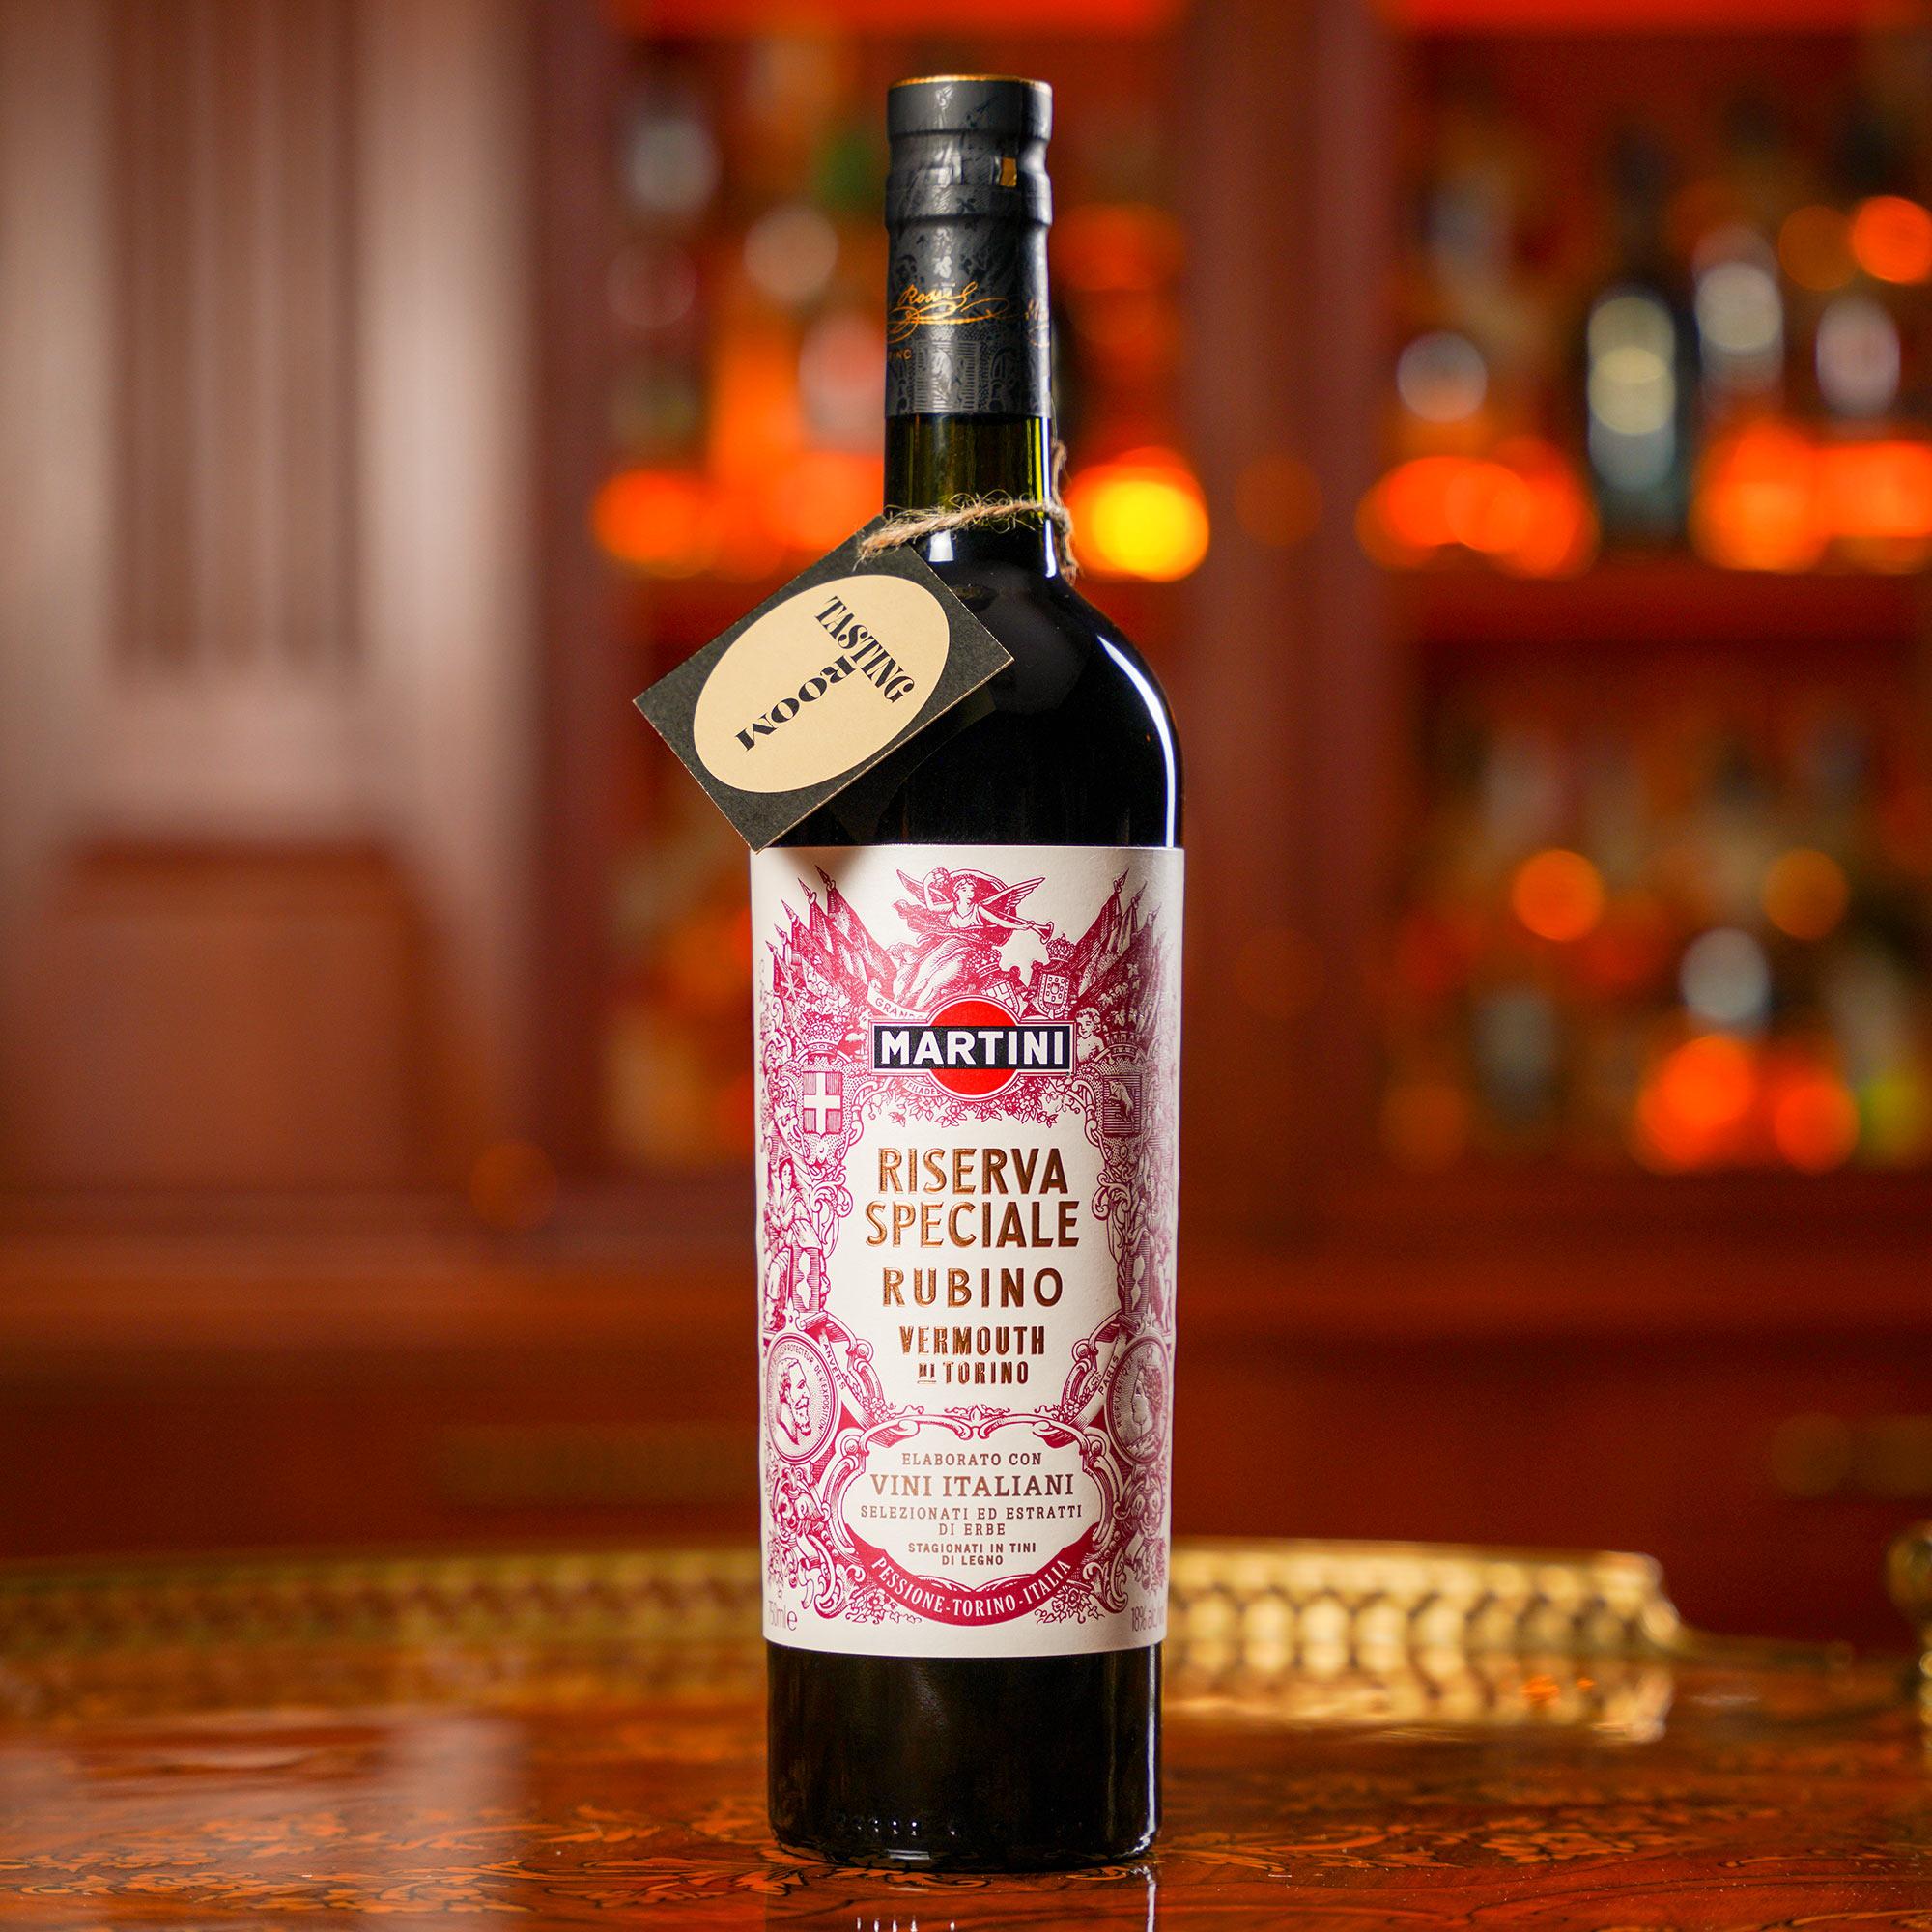 Martini Riserva Speciale Rubino /Мартини Резерва Специале Рубино